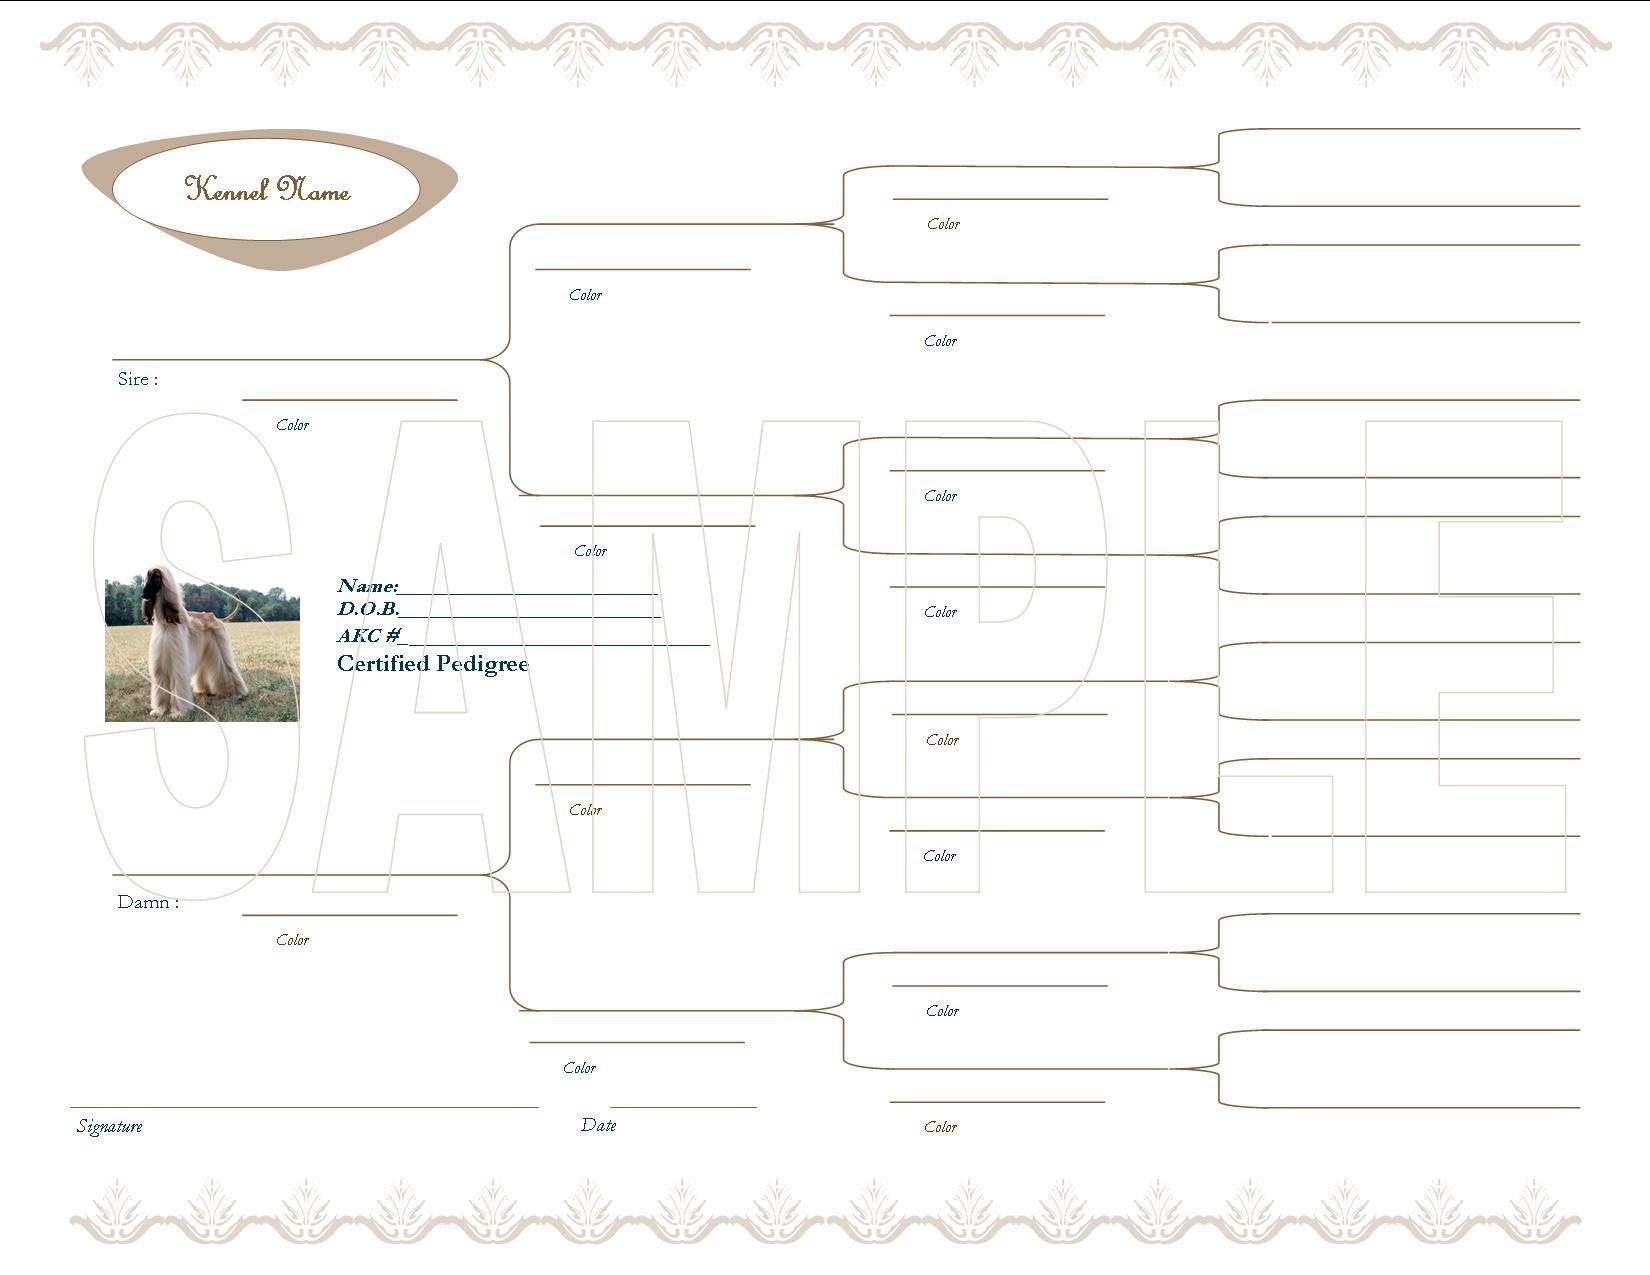 Pedigree Certificate Template Free. Family Tree Template 3 - Free Printable Dog Pedigree Generator